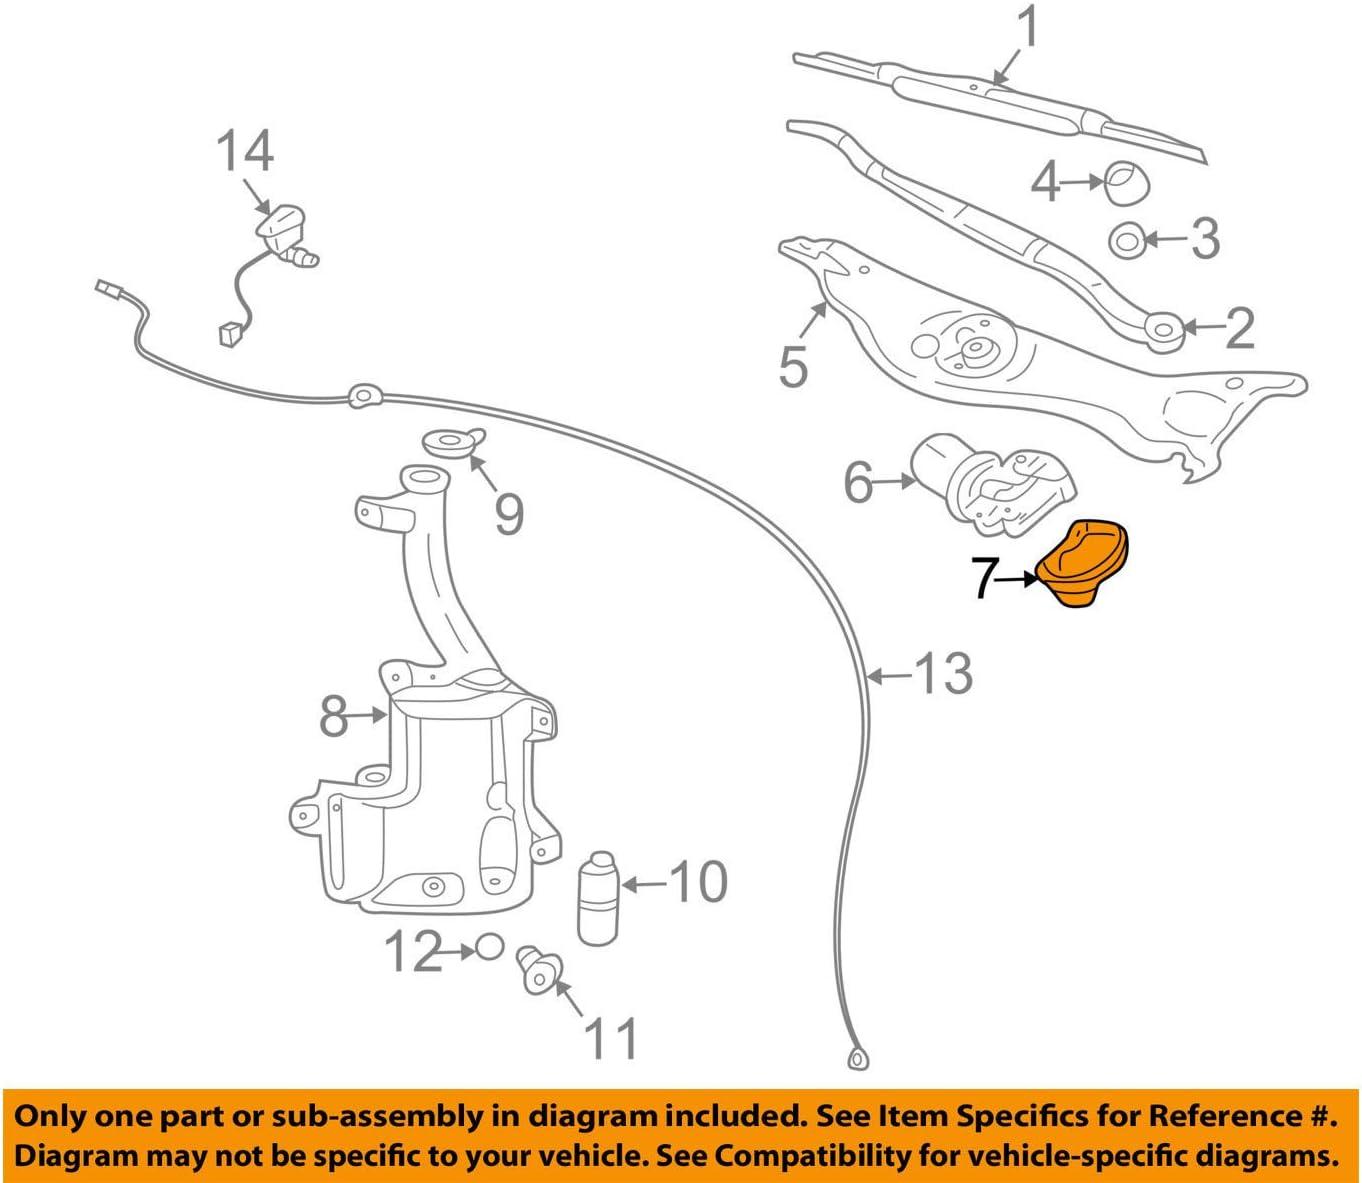 03 cadillac cts engine diagram amazon com general motors 88958172 cover kitwsw mot automotive  general motors 88958172 cover kitwsw